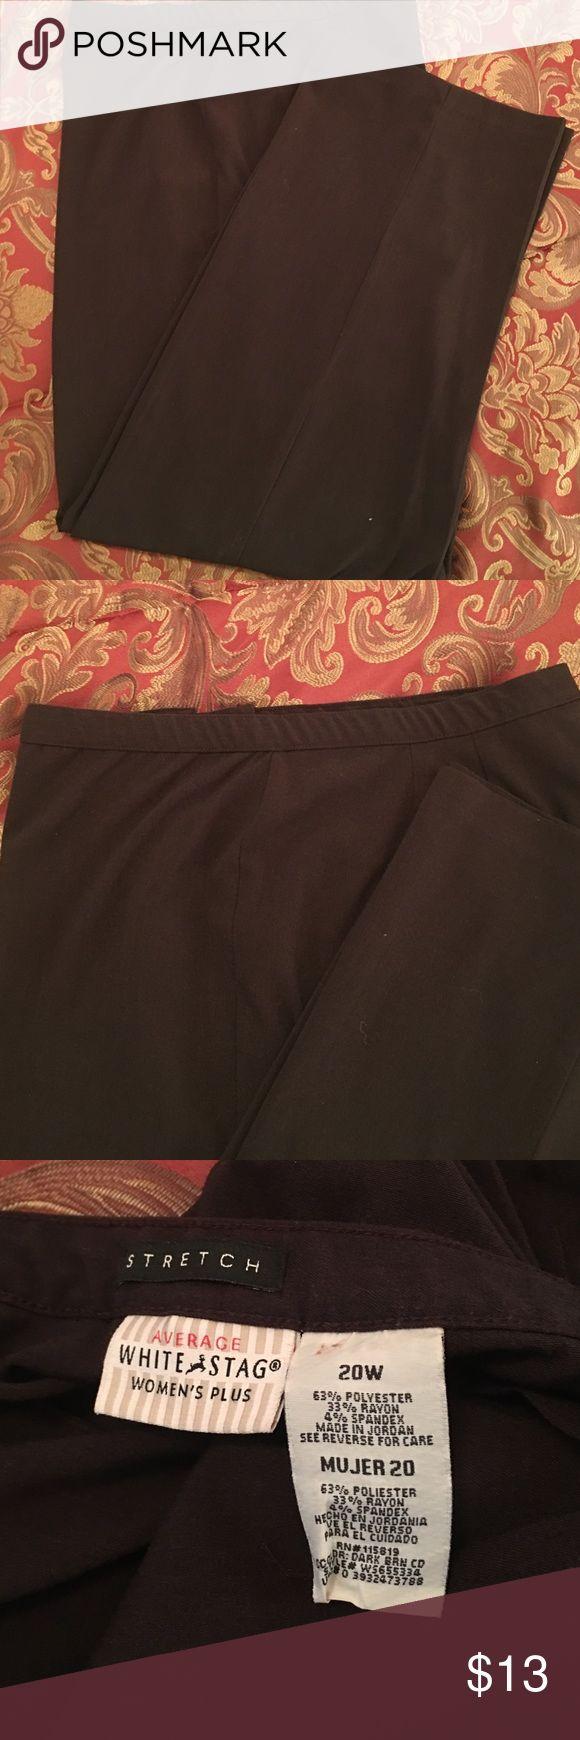 Best 25+ Brown slacks ideas on Pinterest | Normcore, New look ...